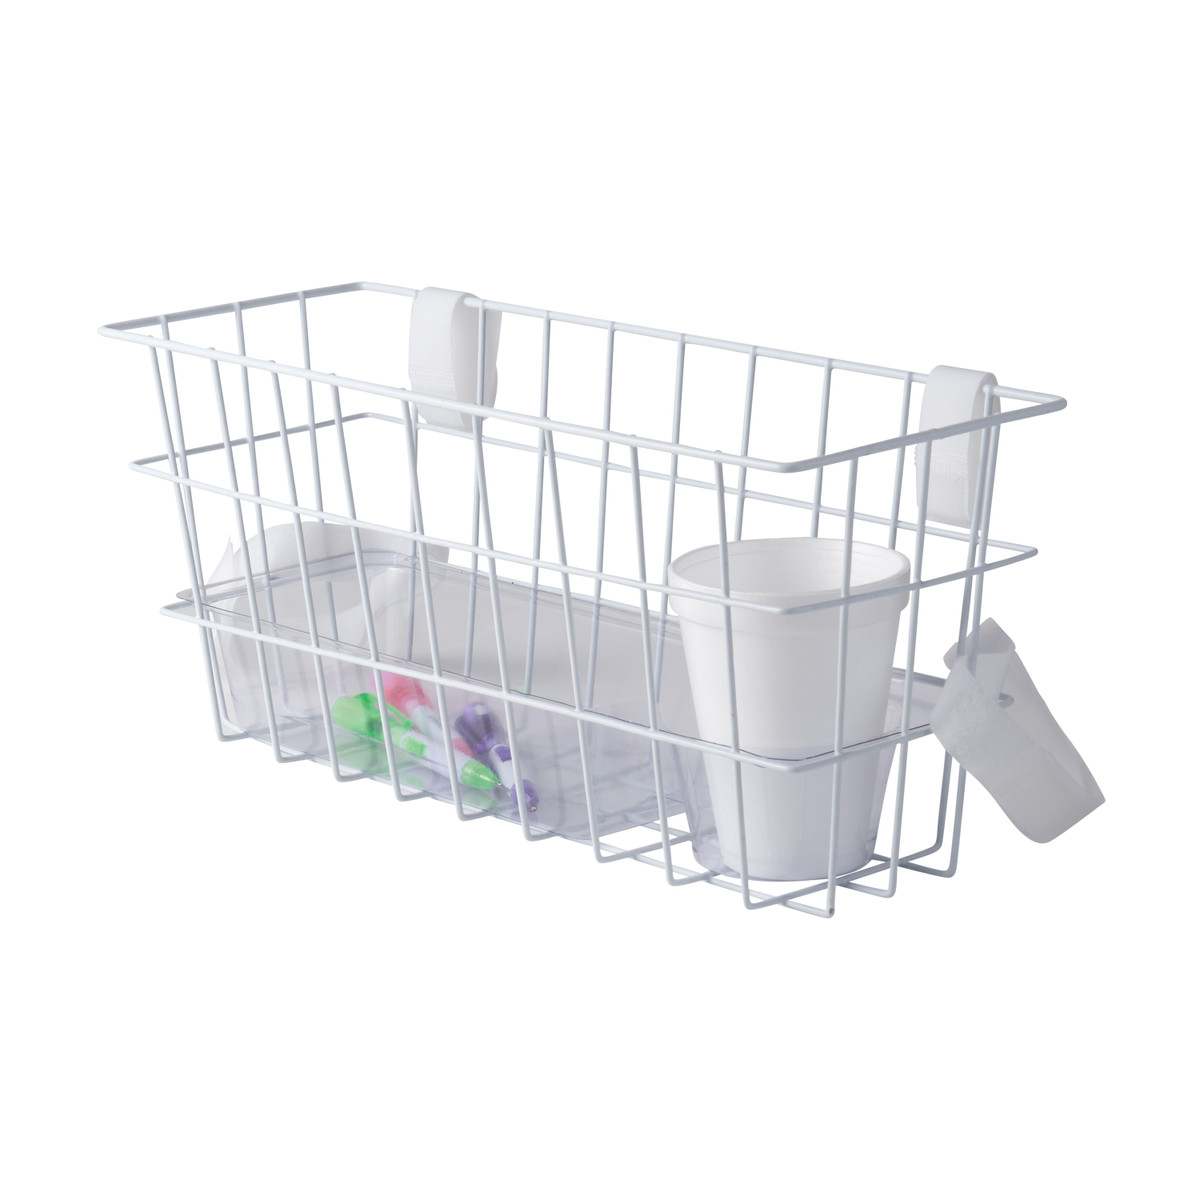 Healthsmart Universal Walker Basket With Plastic Insert